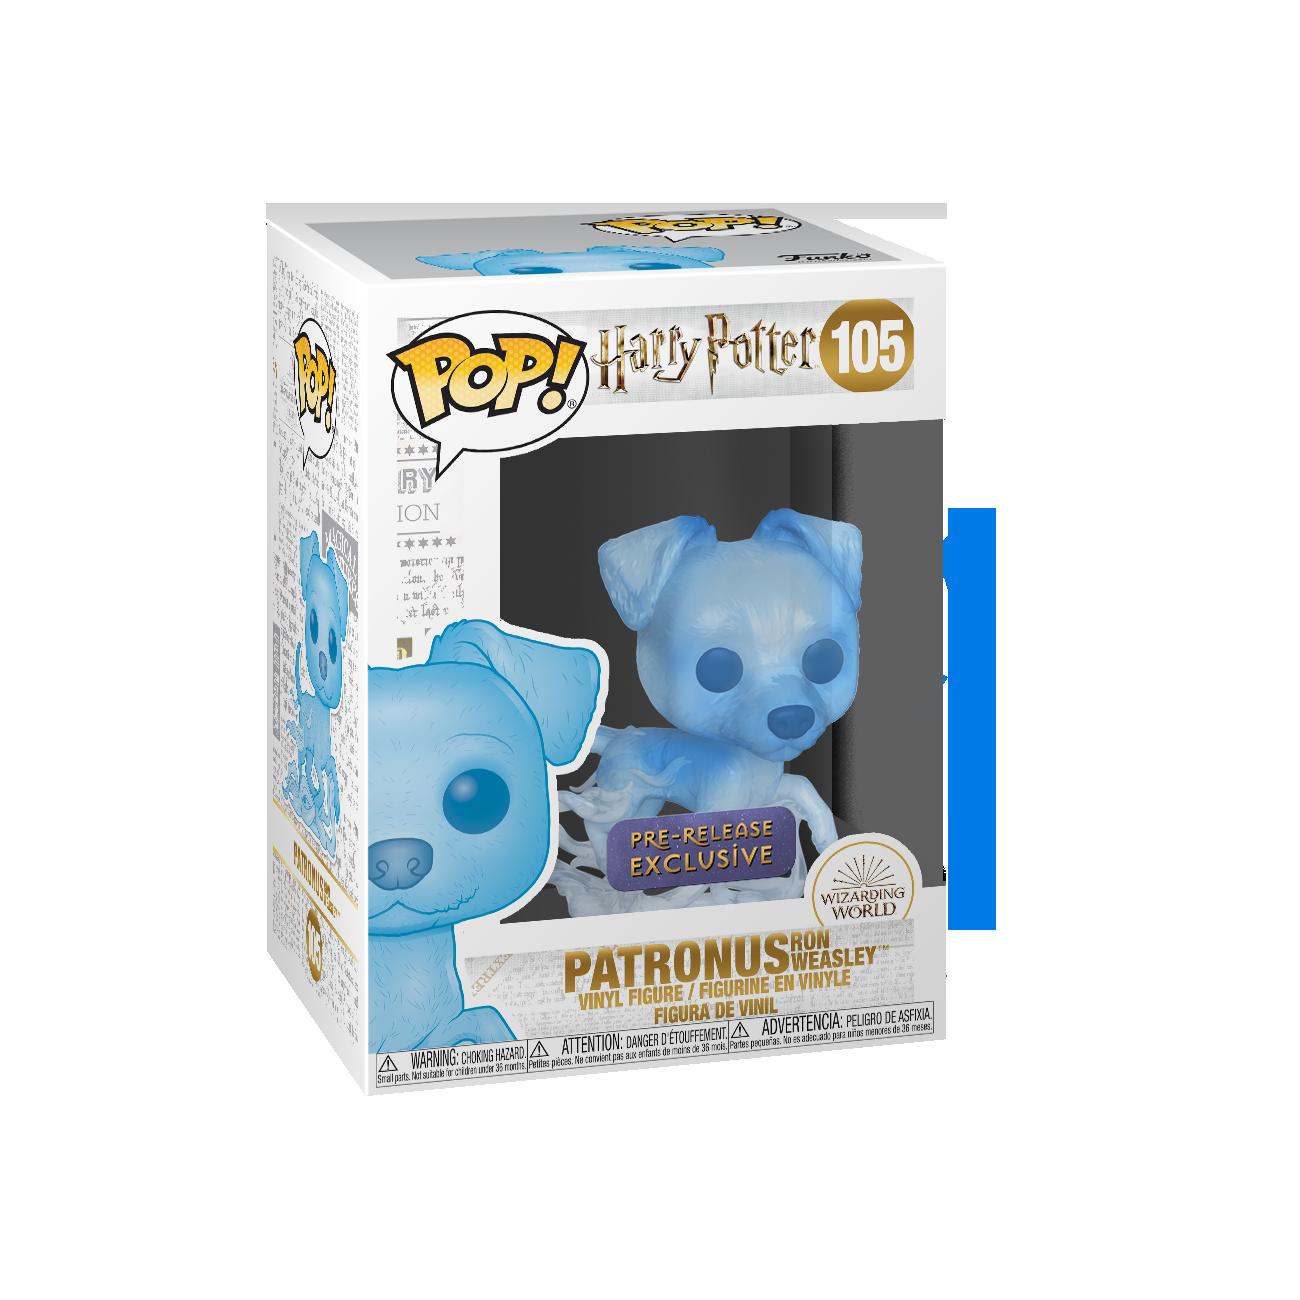 Ron's Patronus Funko Pop!